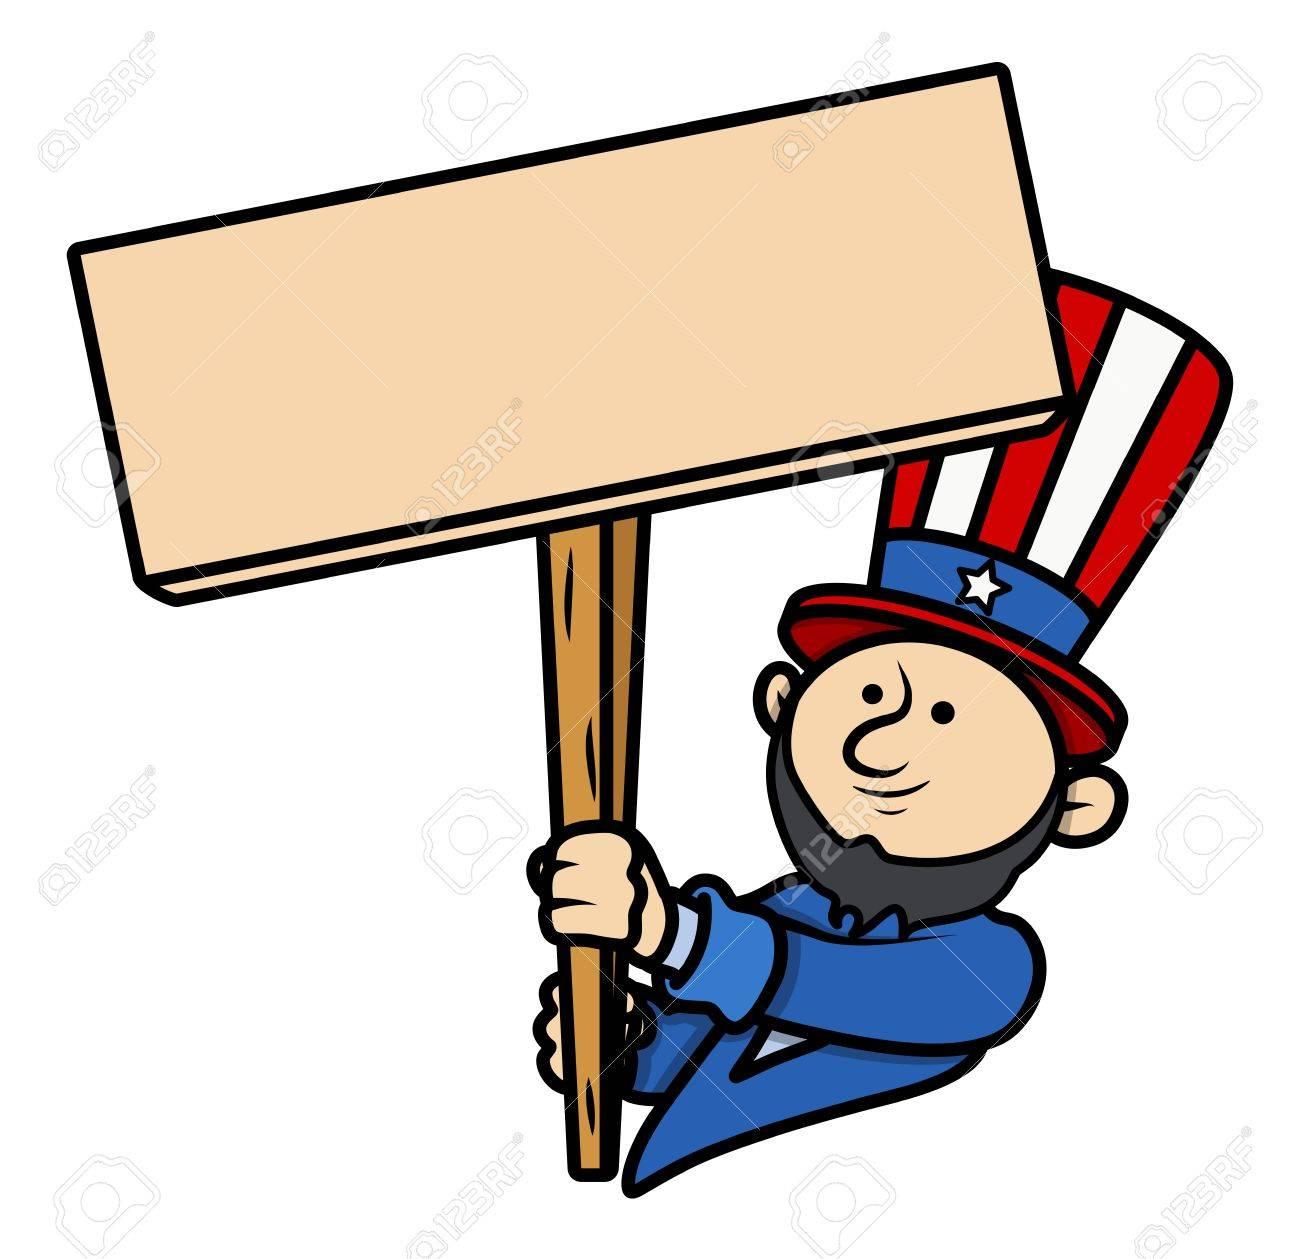 Cartoon Clip Art Lincoln Holding A Blank Board Royalty Free